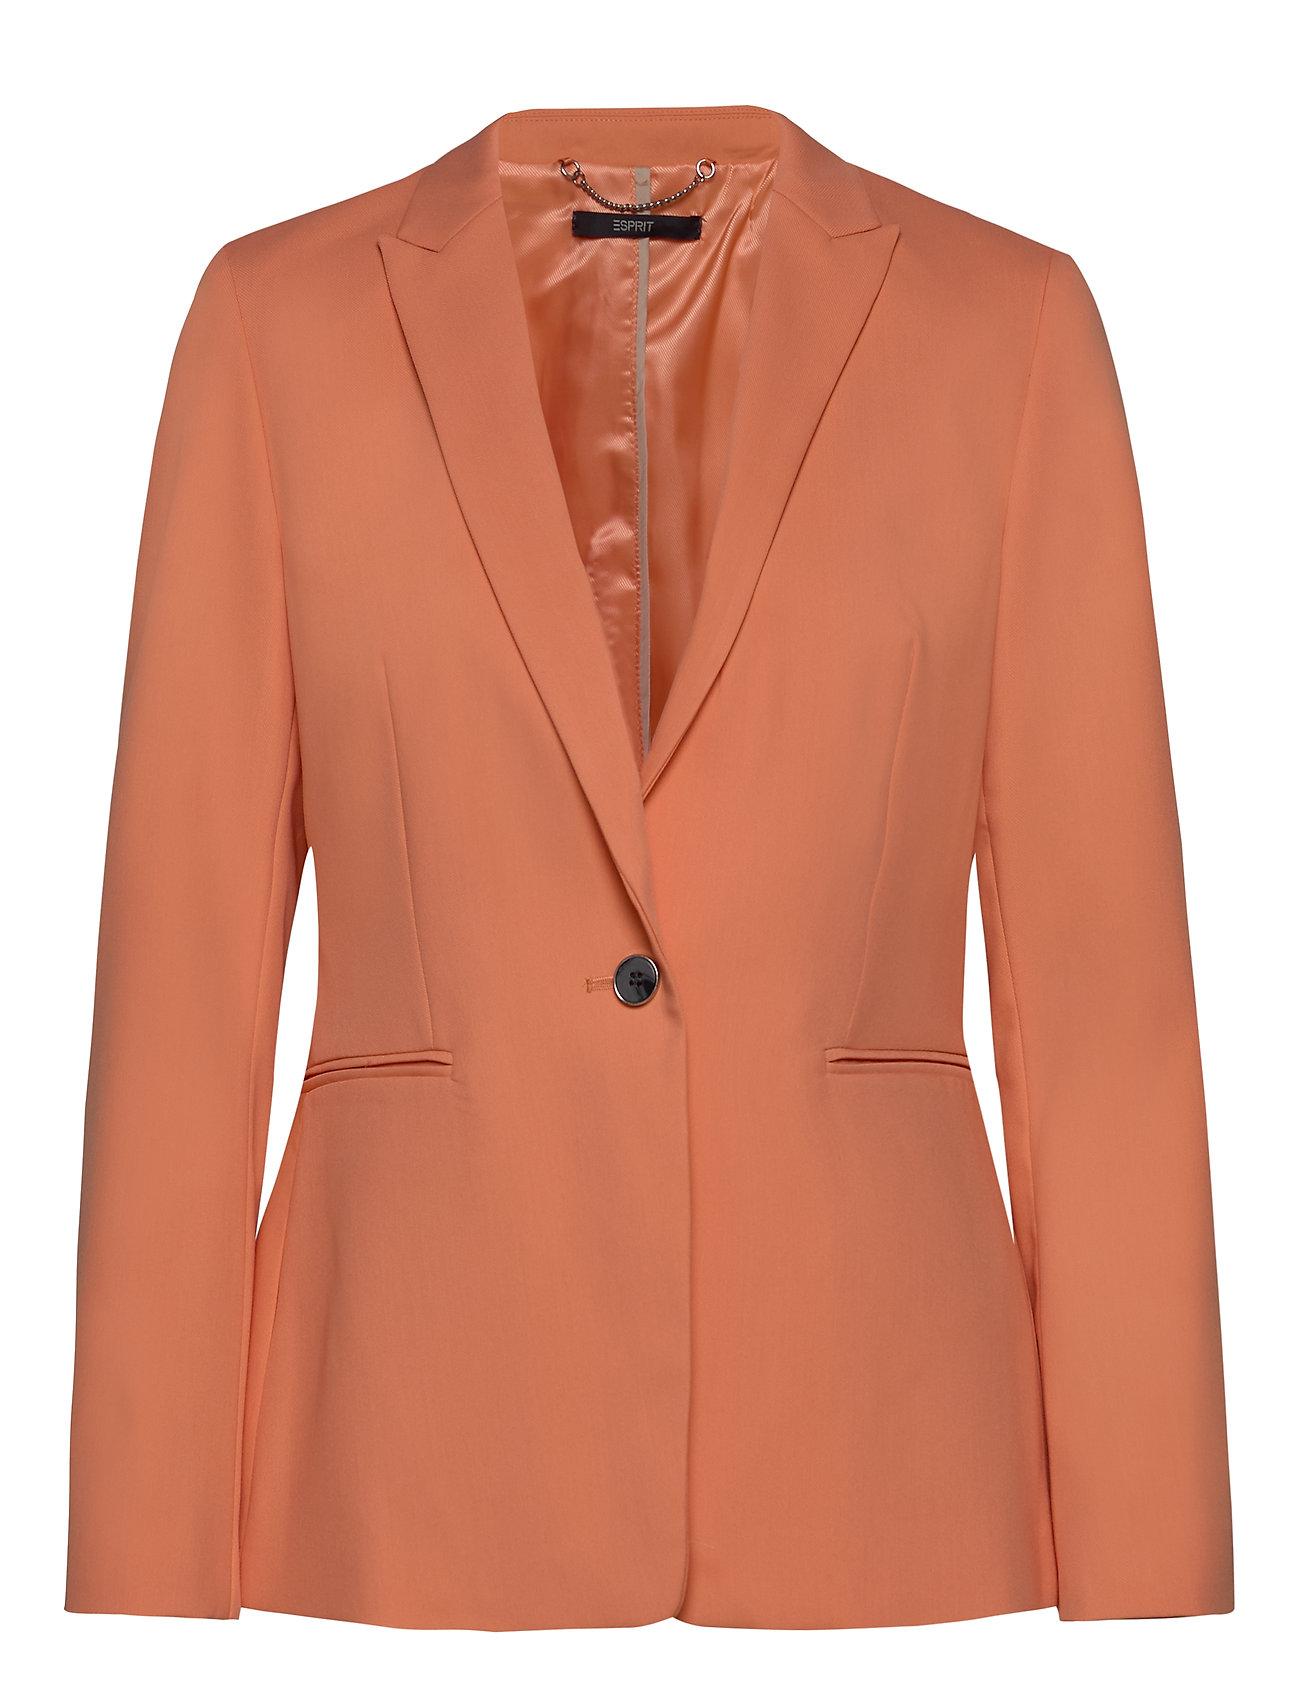 Esprit Collection Blazers woven - PEACH